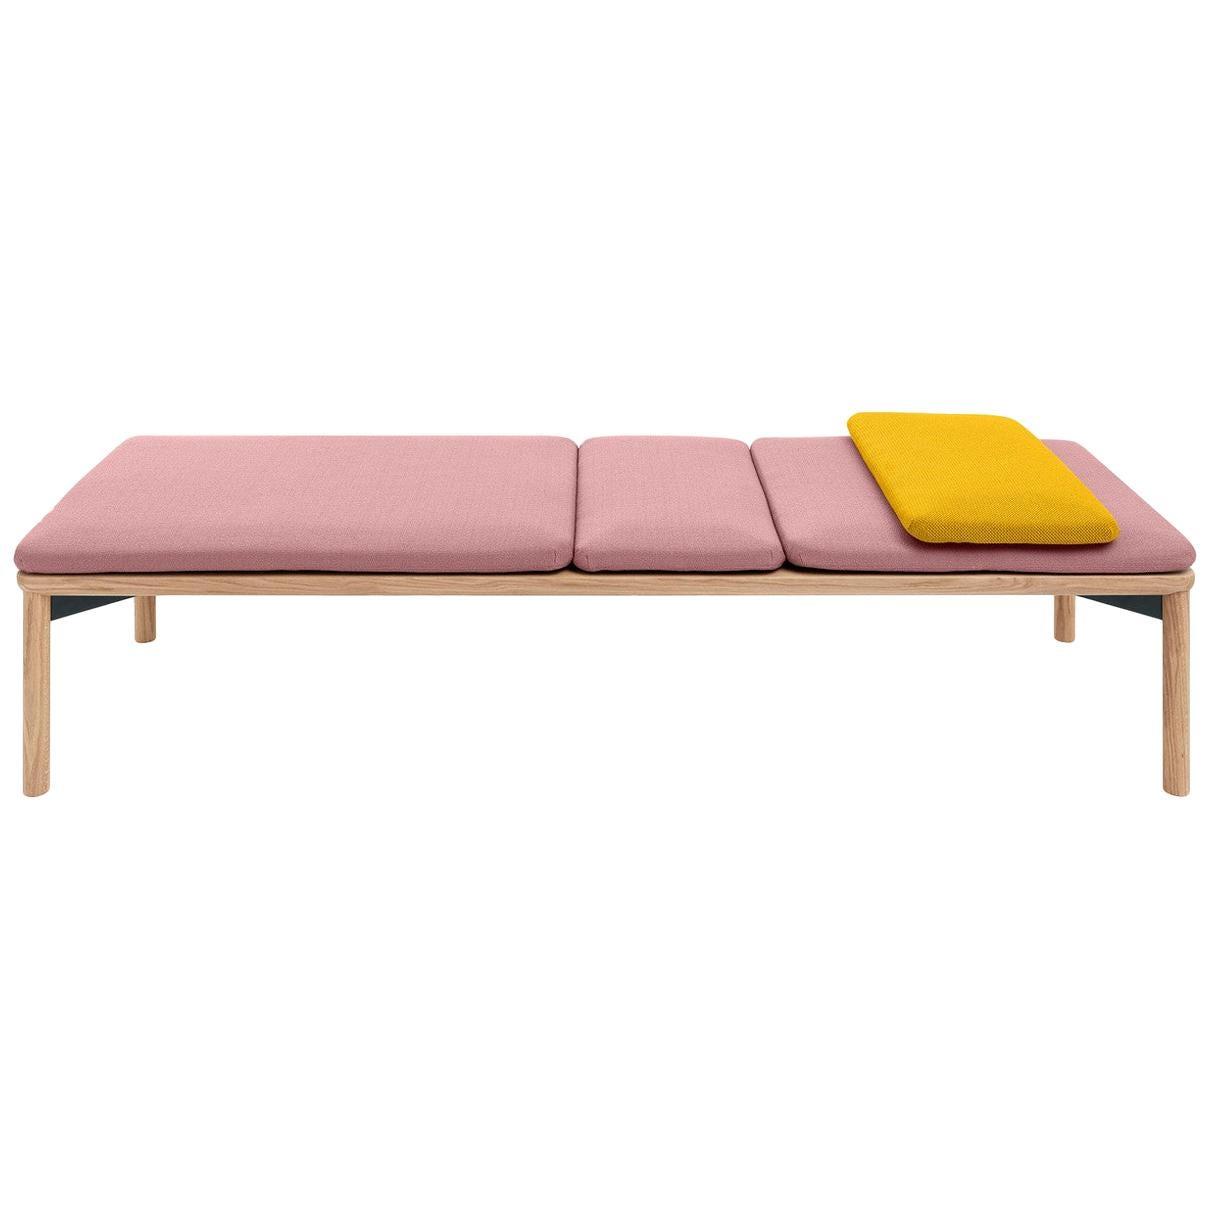 Charpai Bench Designed by Hanne Willmann